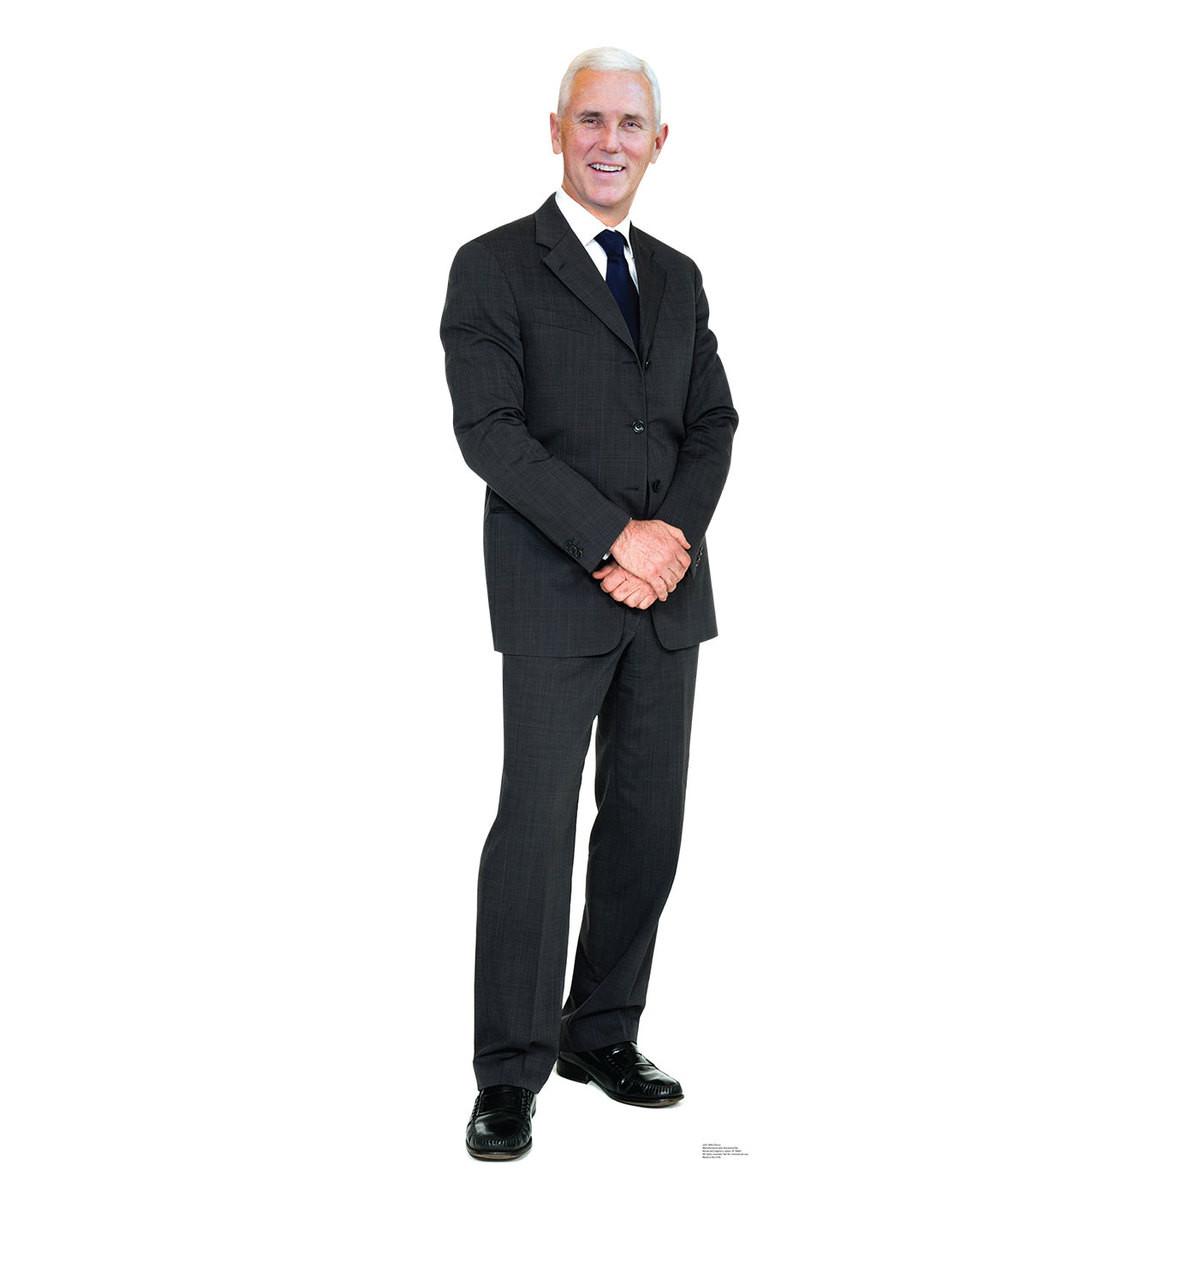 Life-size Vice President Mike Pence Cardboard Standup | Cardboard Cutout 2